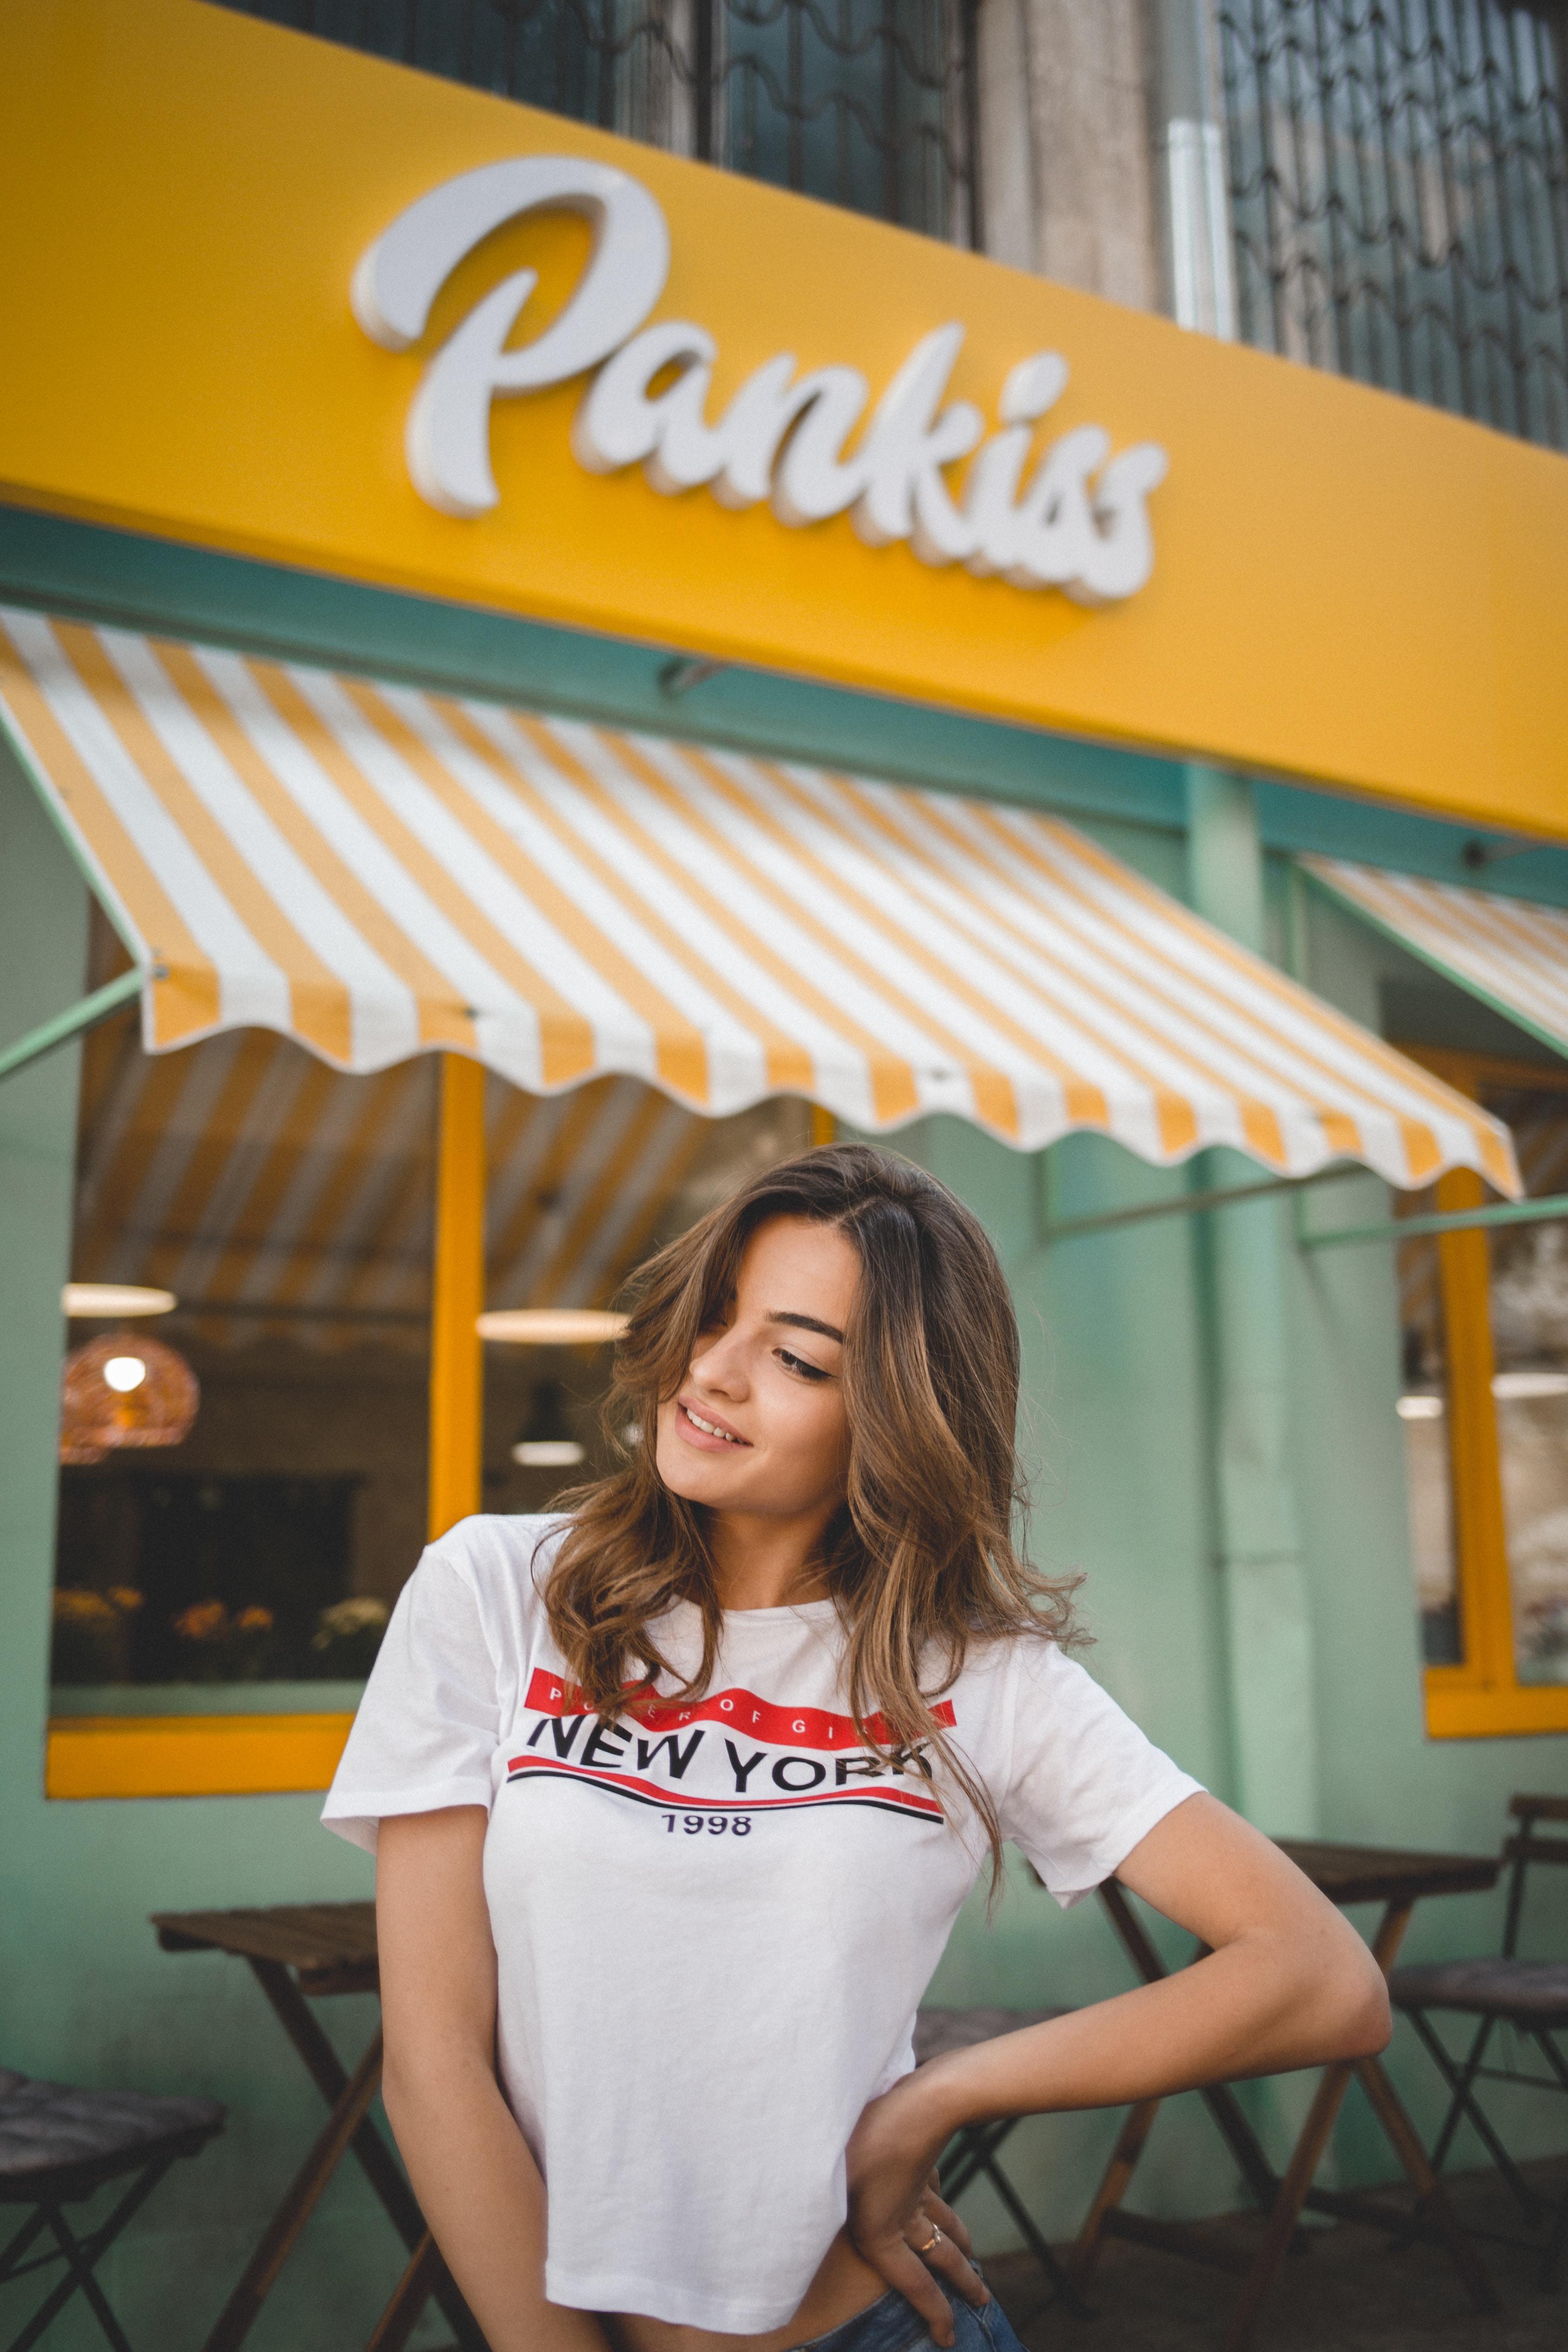 woman wearing white t-shirt standing near Pankiss facade